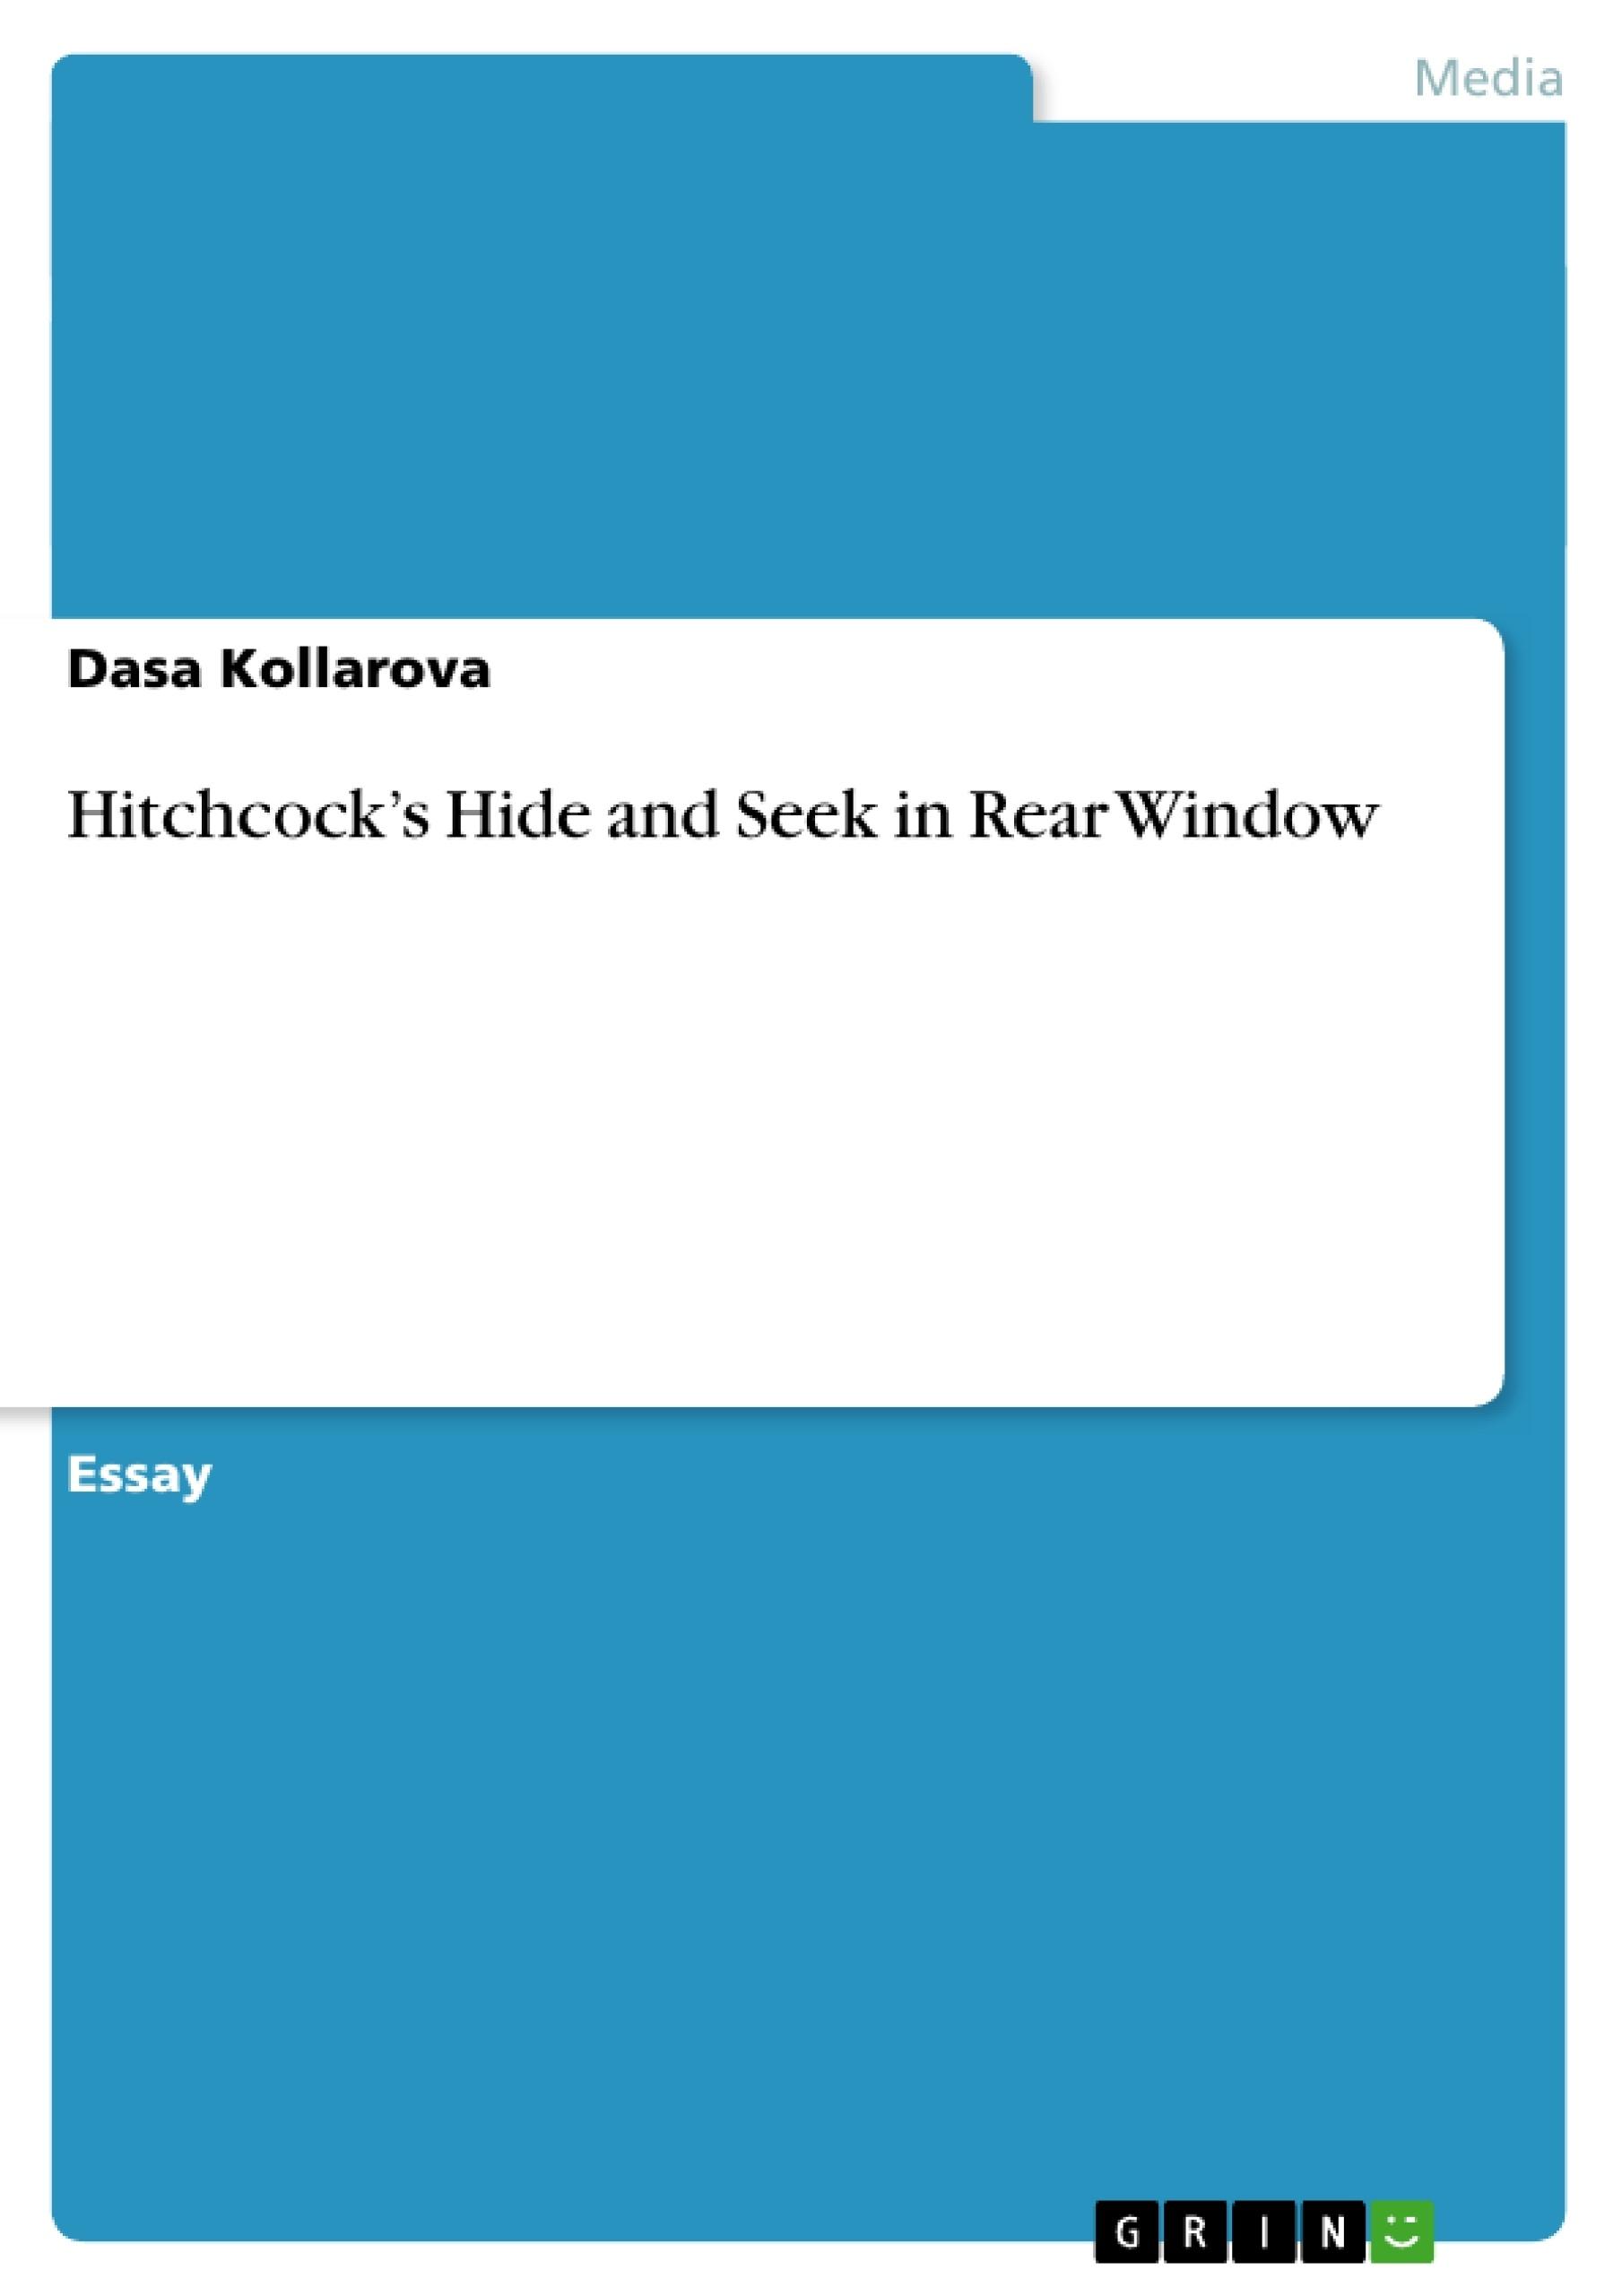 Title: Hitchcock's Hide and Seek in  Rear Window